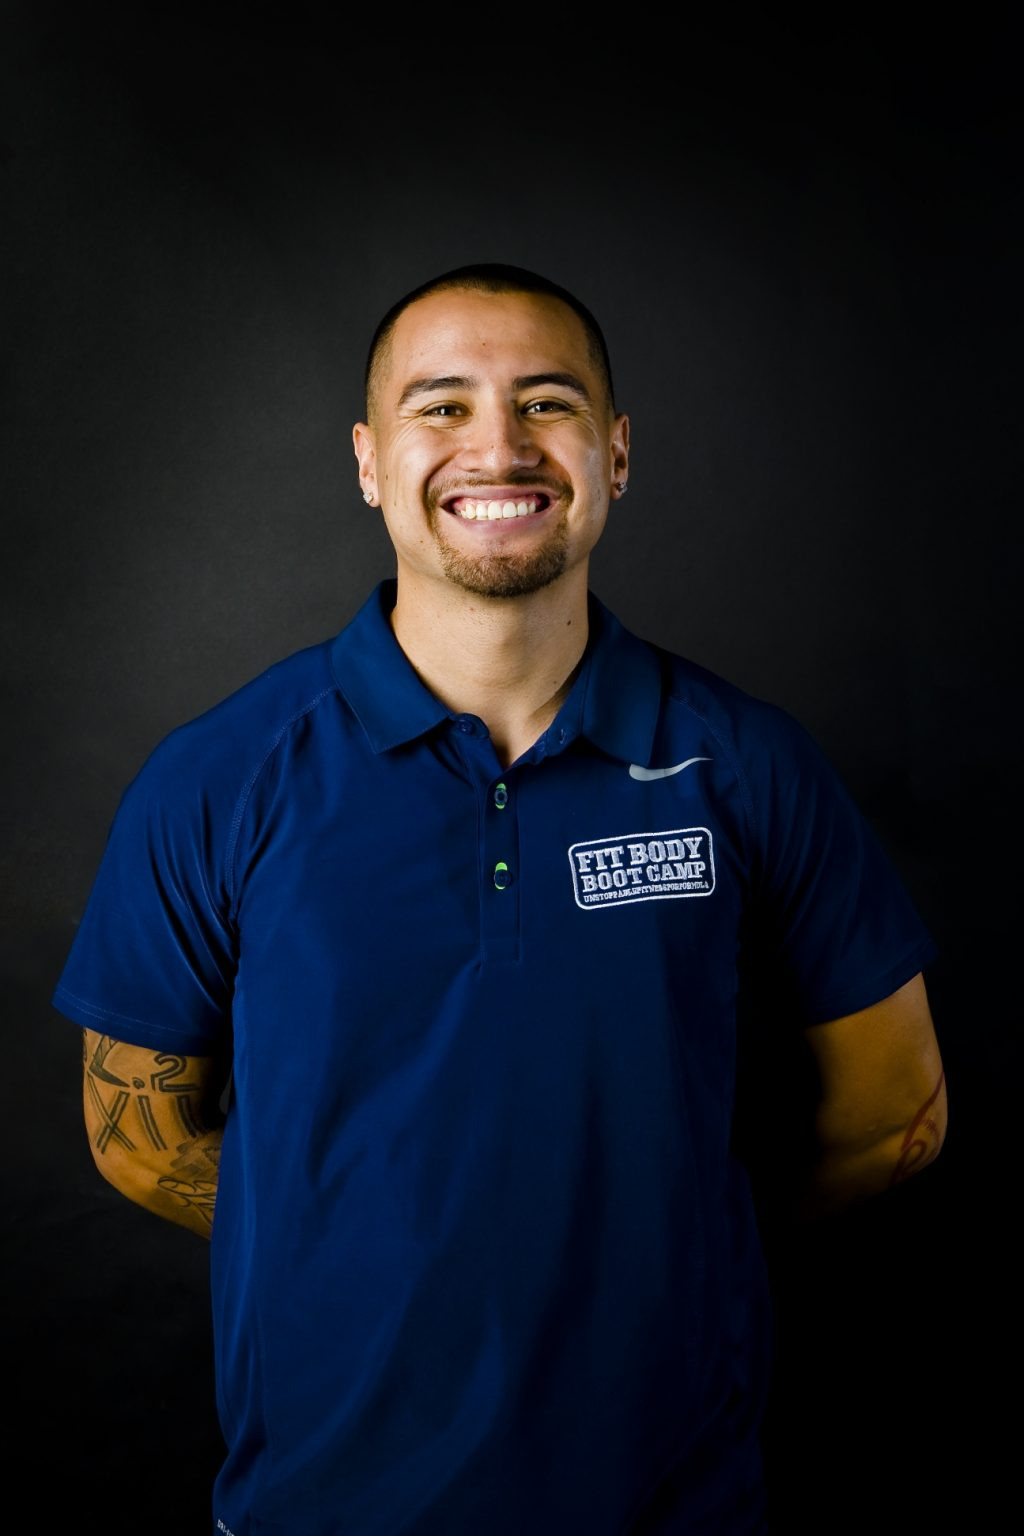 Personal Trainer Houston, Texas - Anthony Briseno